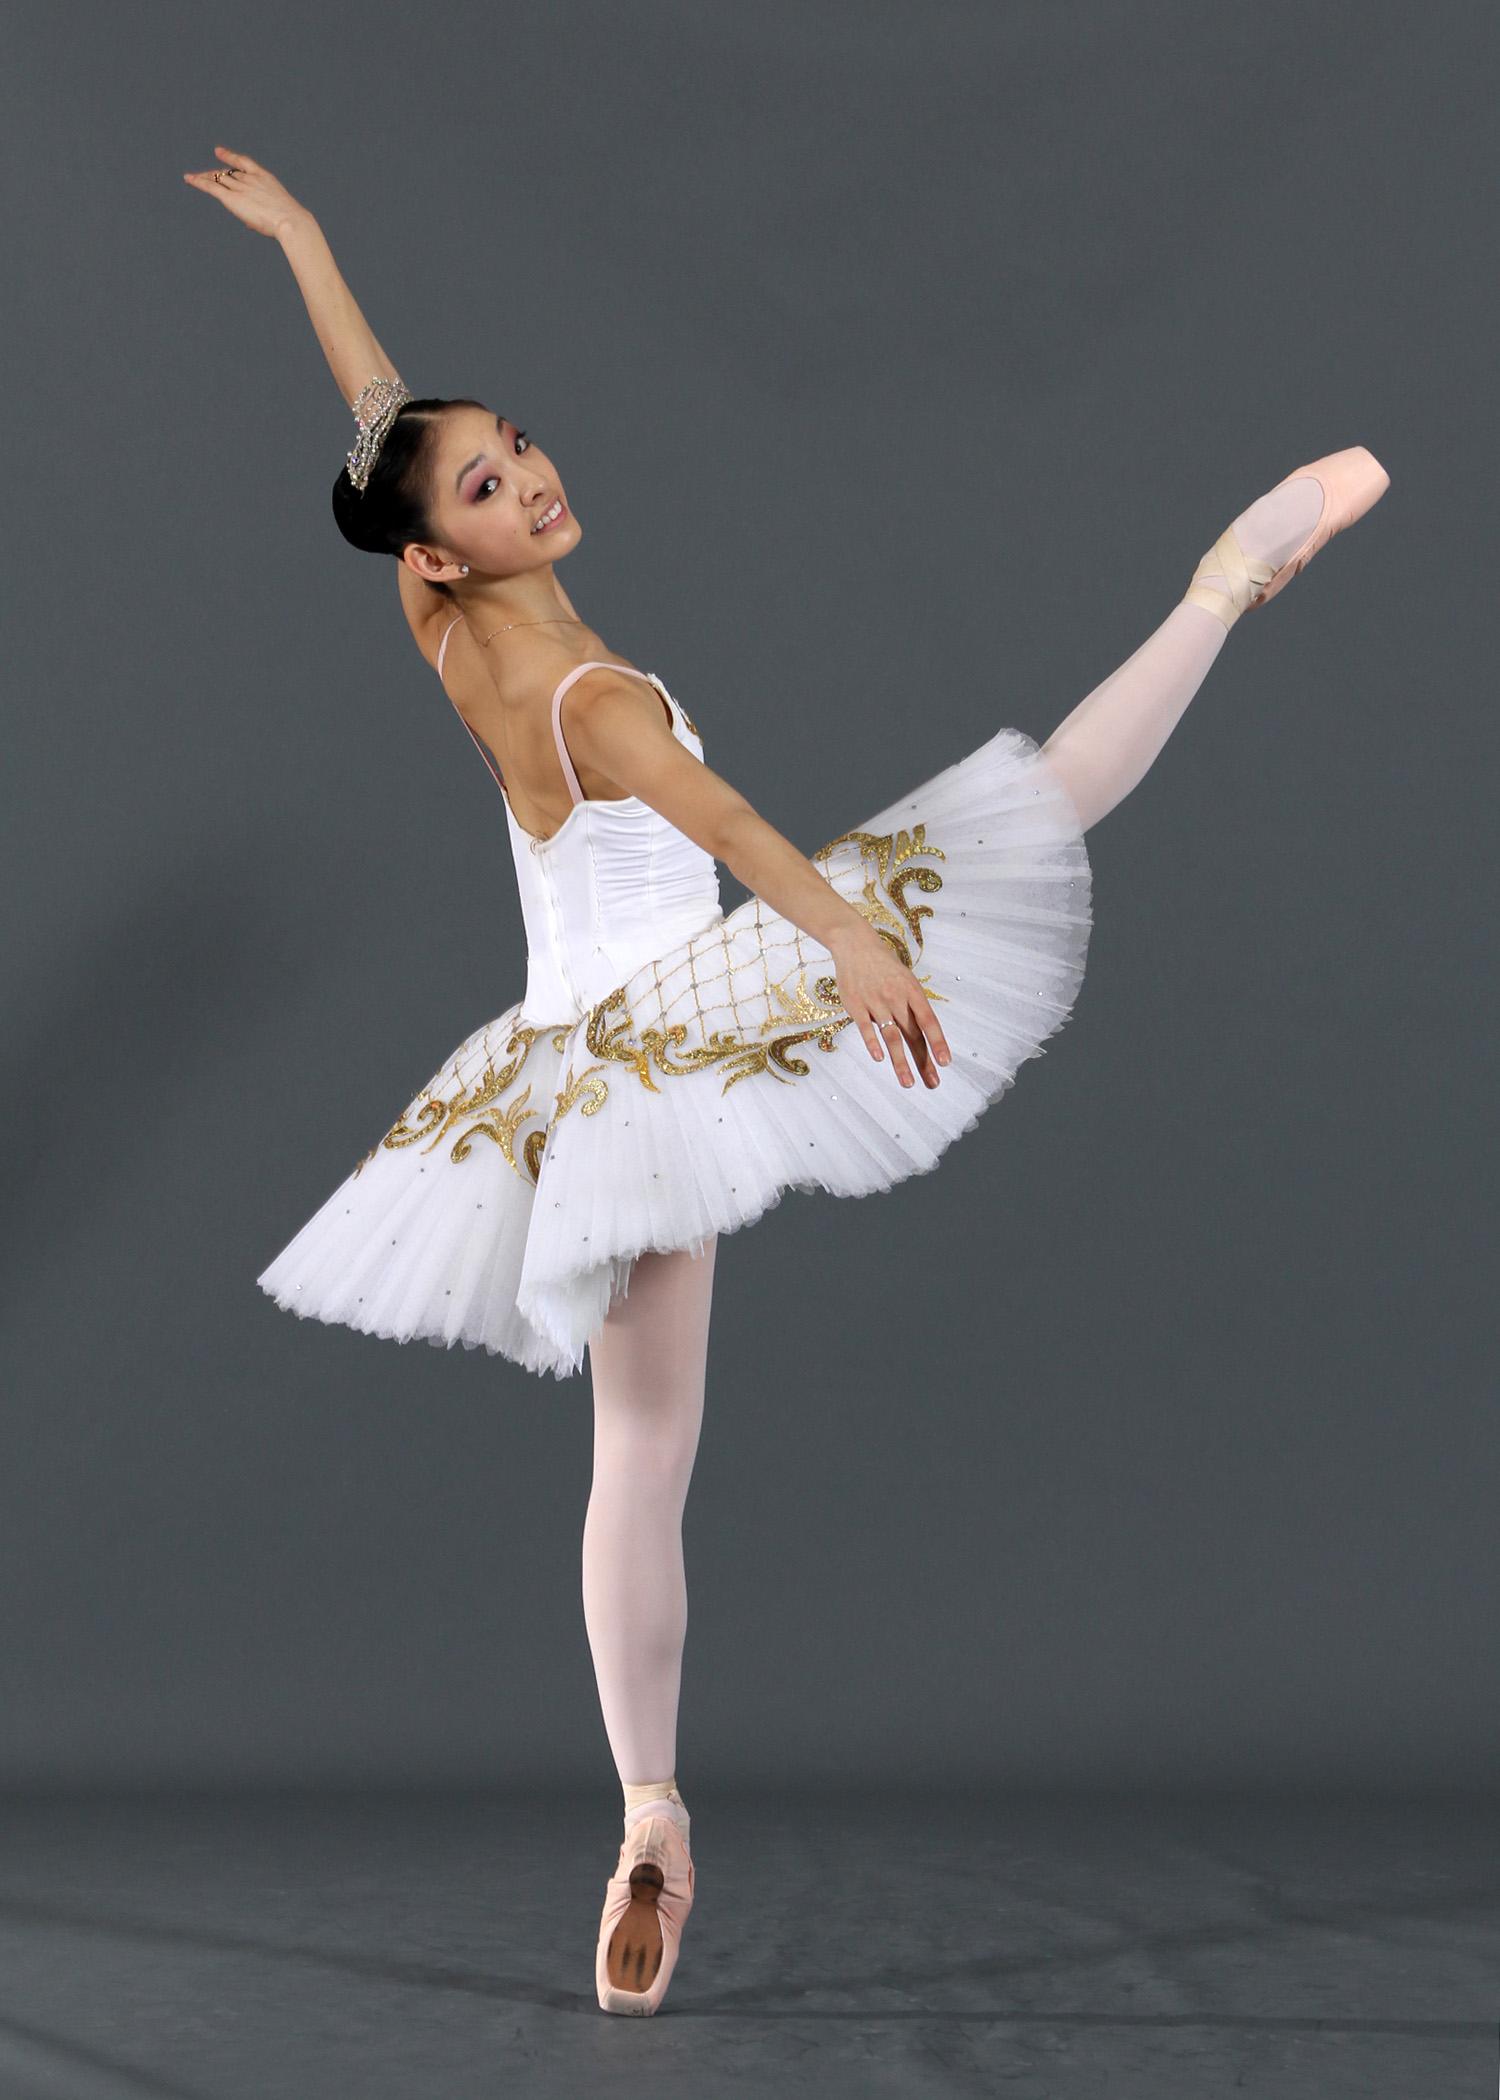 Best Brands Of Ballet Shoes